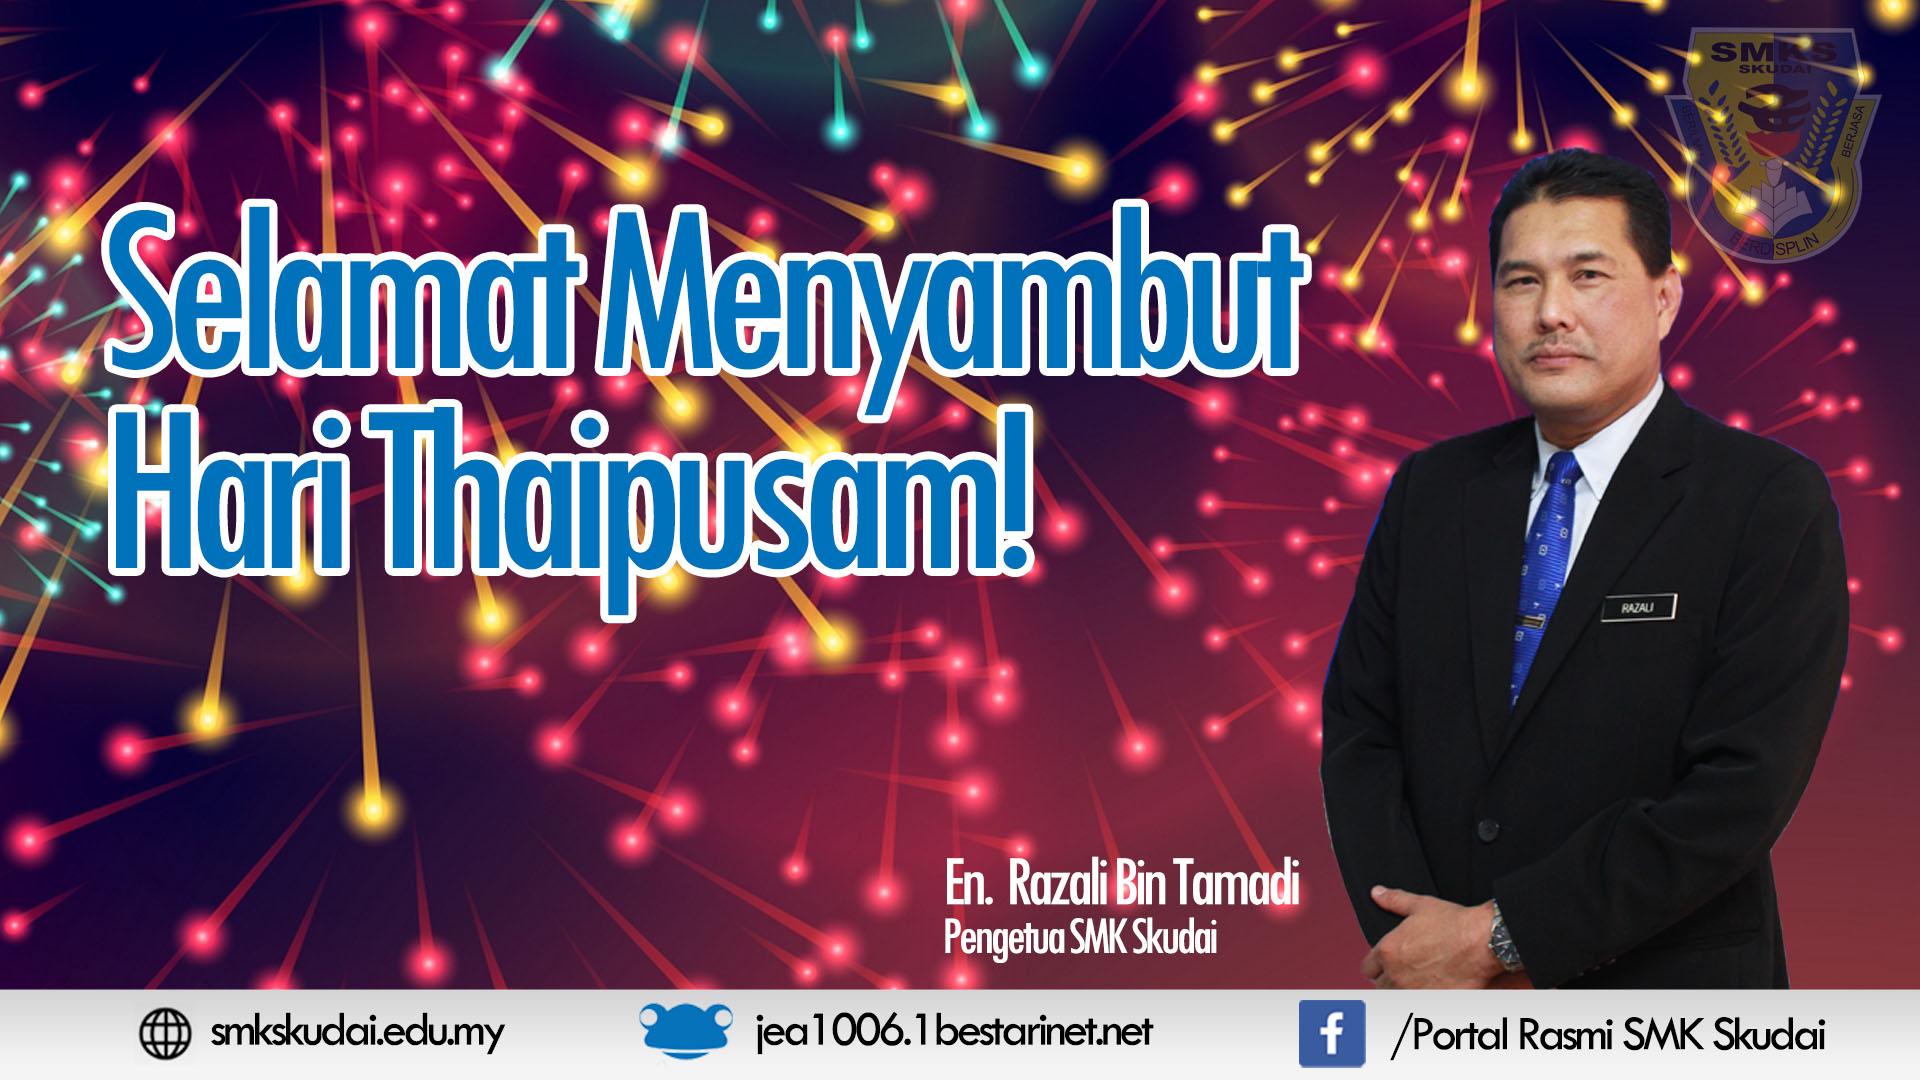 Selamat Menyambut Hari Thaipusam 2018